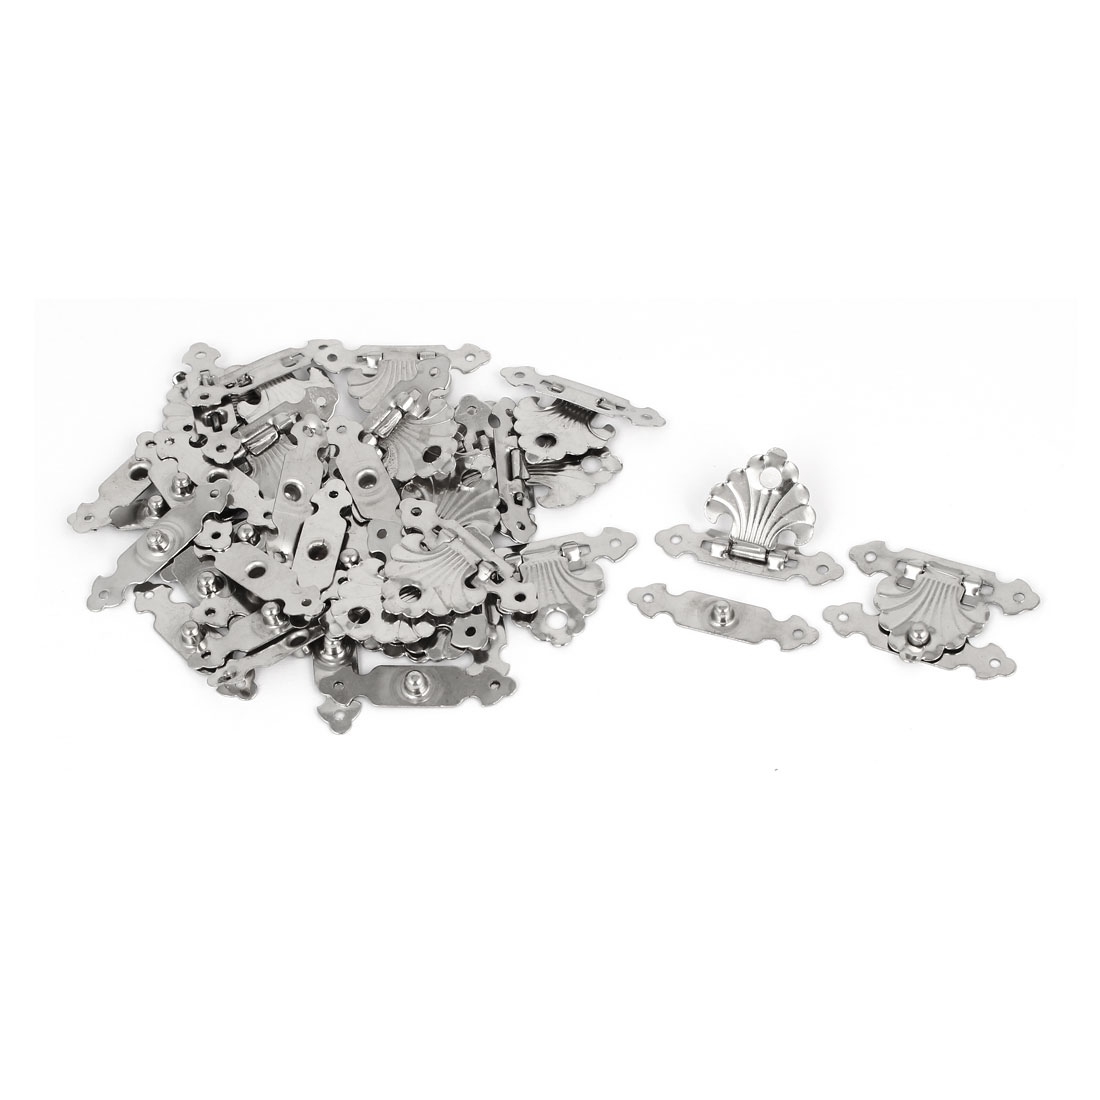 Toolbox Cases Iron Box Toggle Latch Hasp Silver Tone 36mm x 24mm x 4mm 20pcs